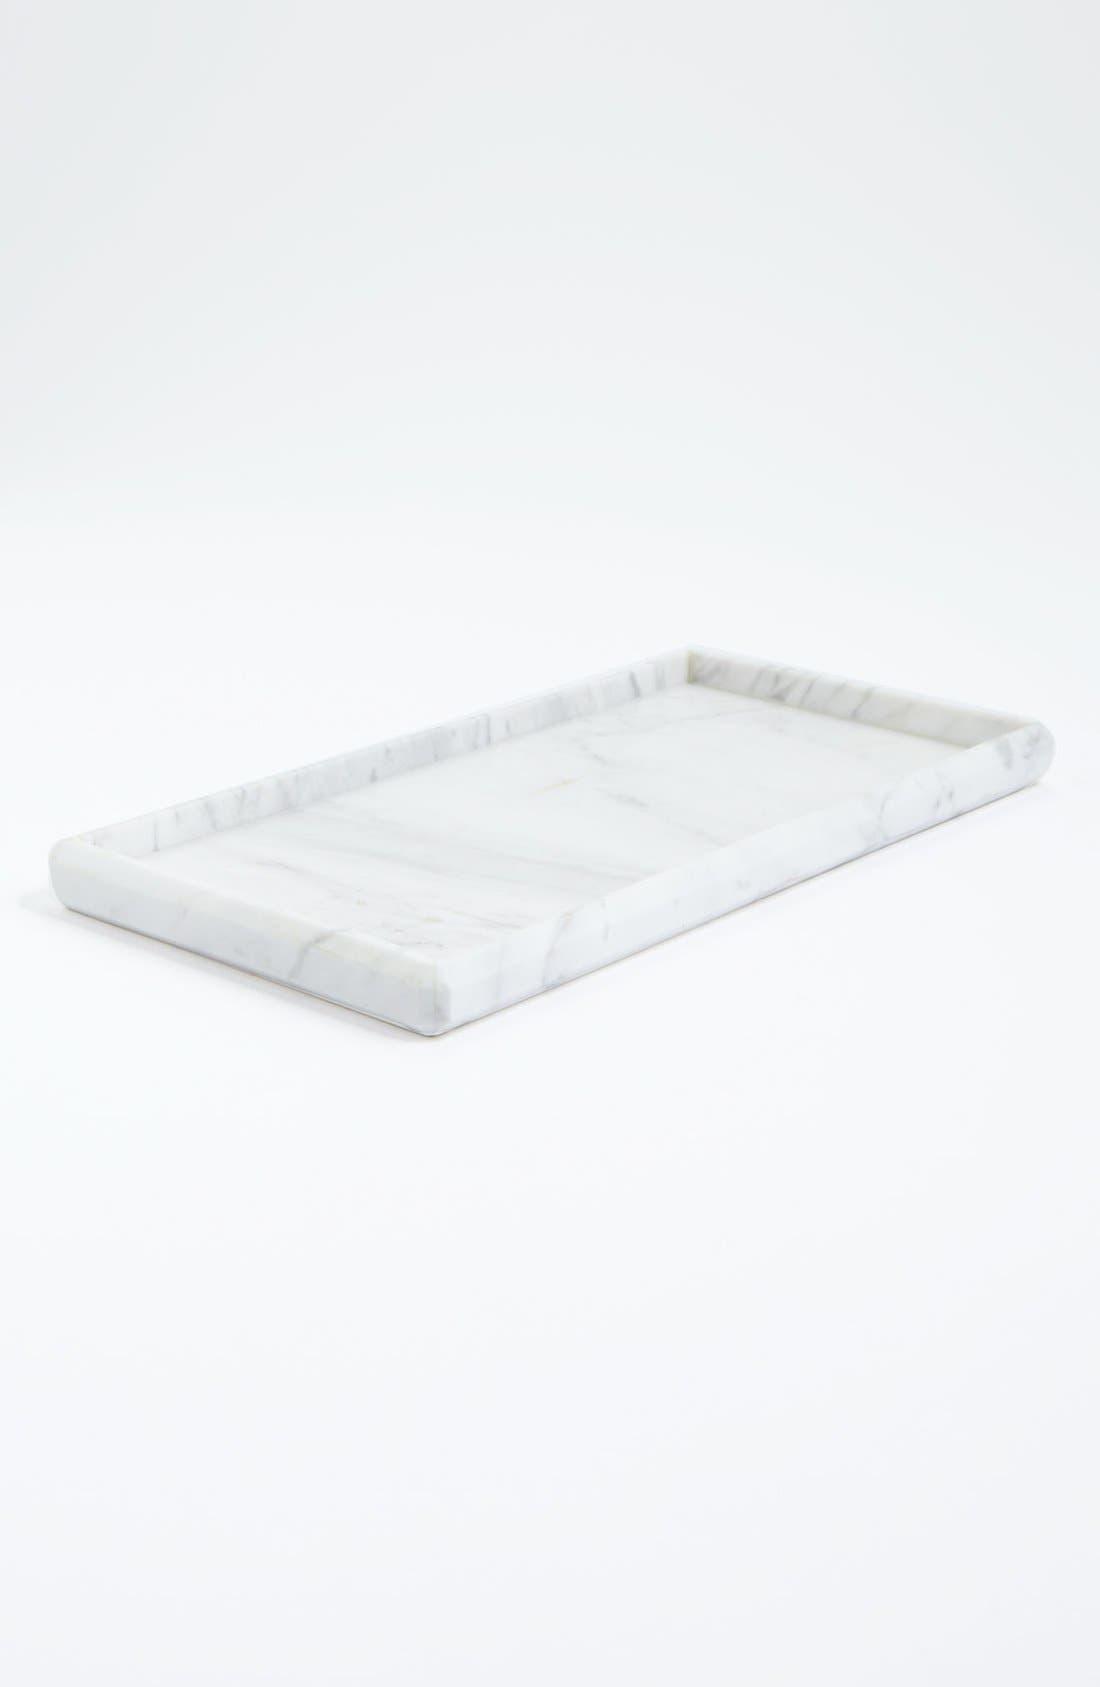 waterworks studio luna white marble tray (online only)  nordstrom -